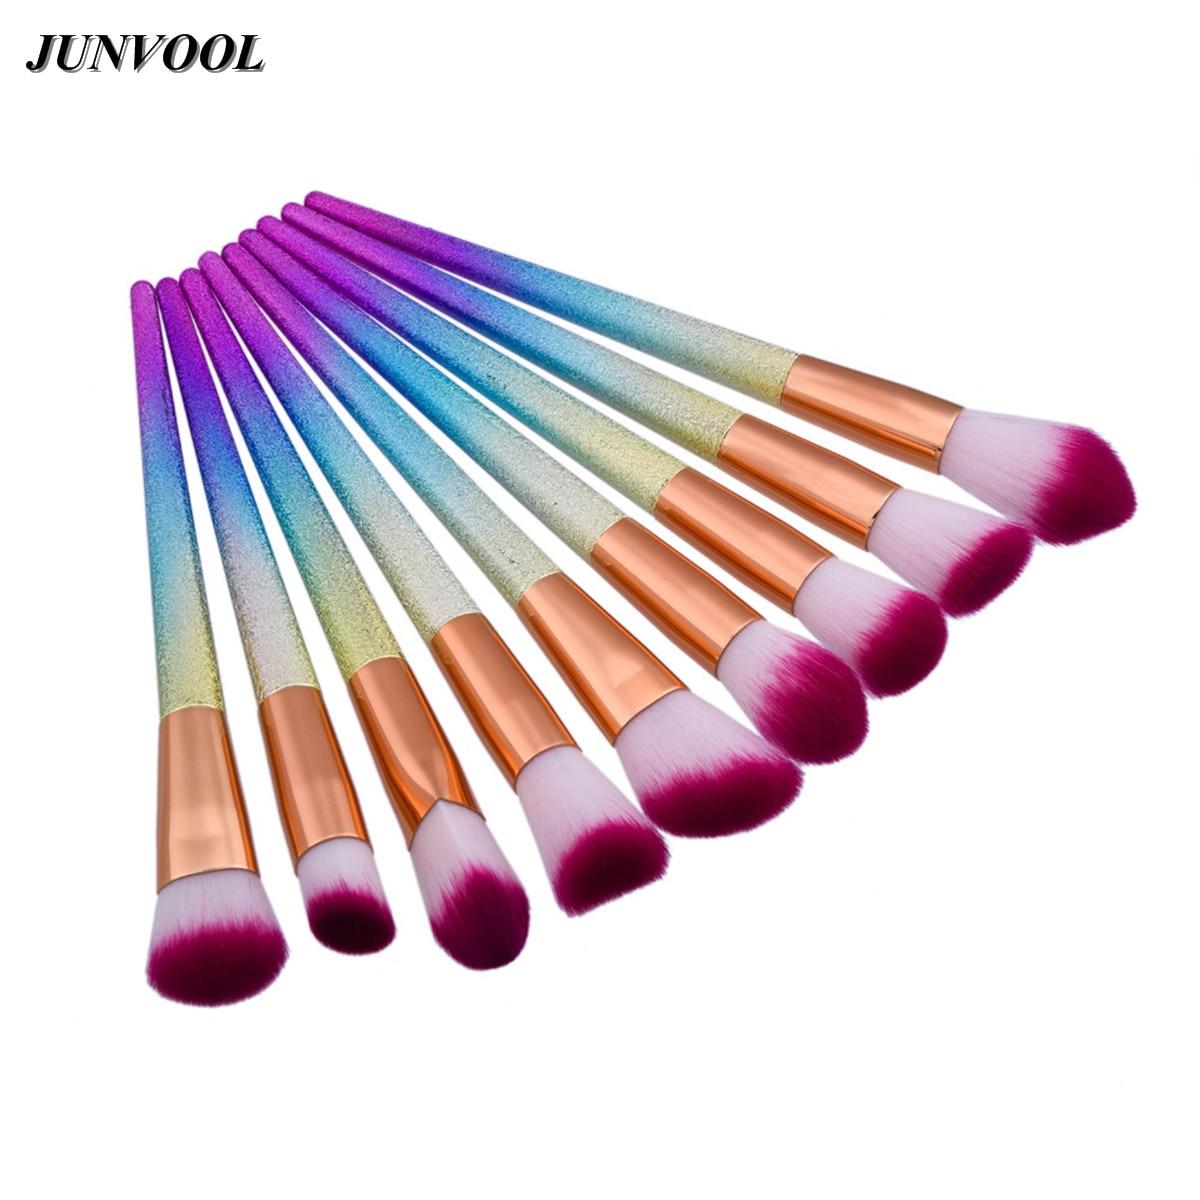 Gradient Color Makeup Brush 9Pcs Professional Cone Rainbow Handle Makeup Brushes Cosmetics Blusher Powder Blending Smooth Brush